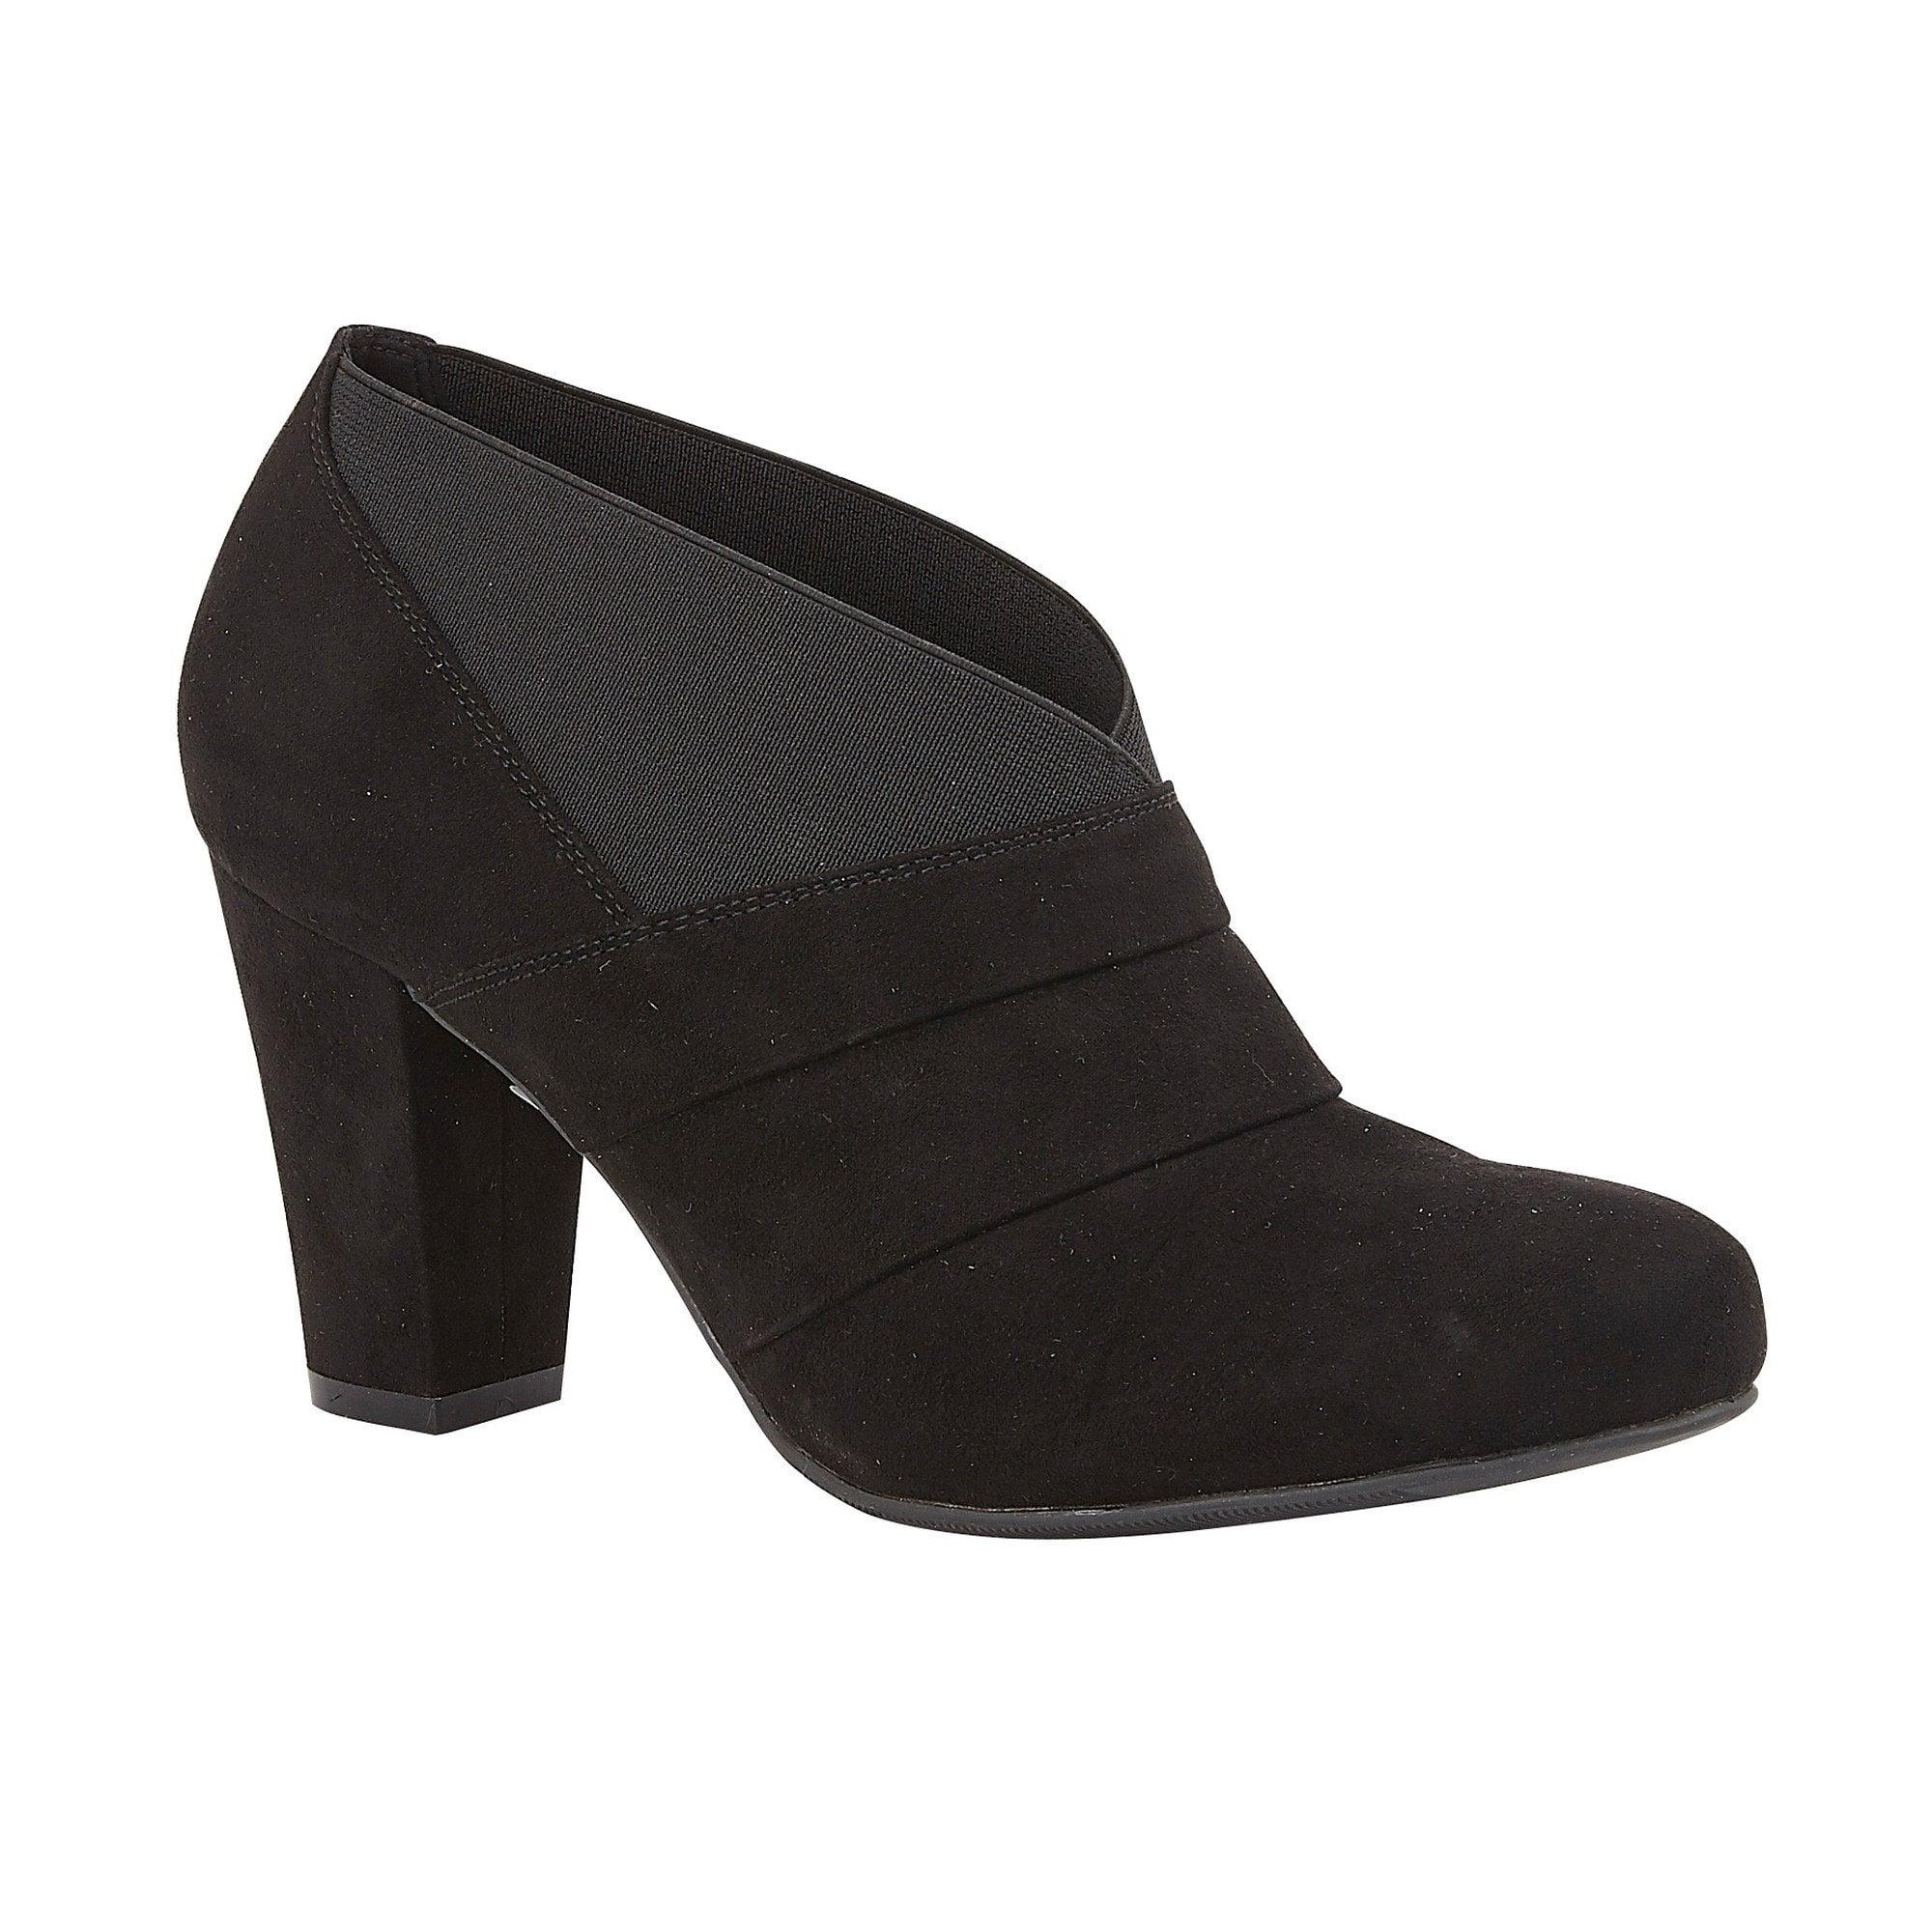 Buy the Lotus ladies' Aurora shoe boot